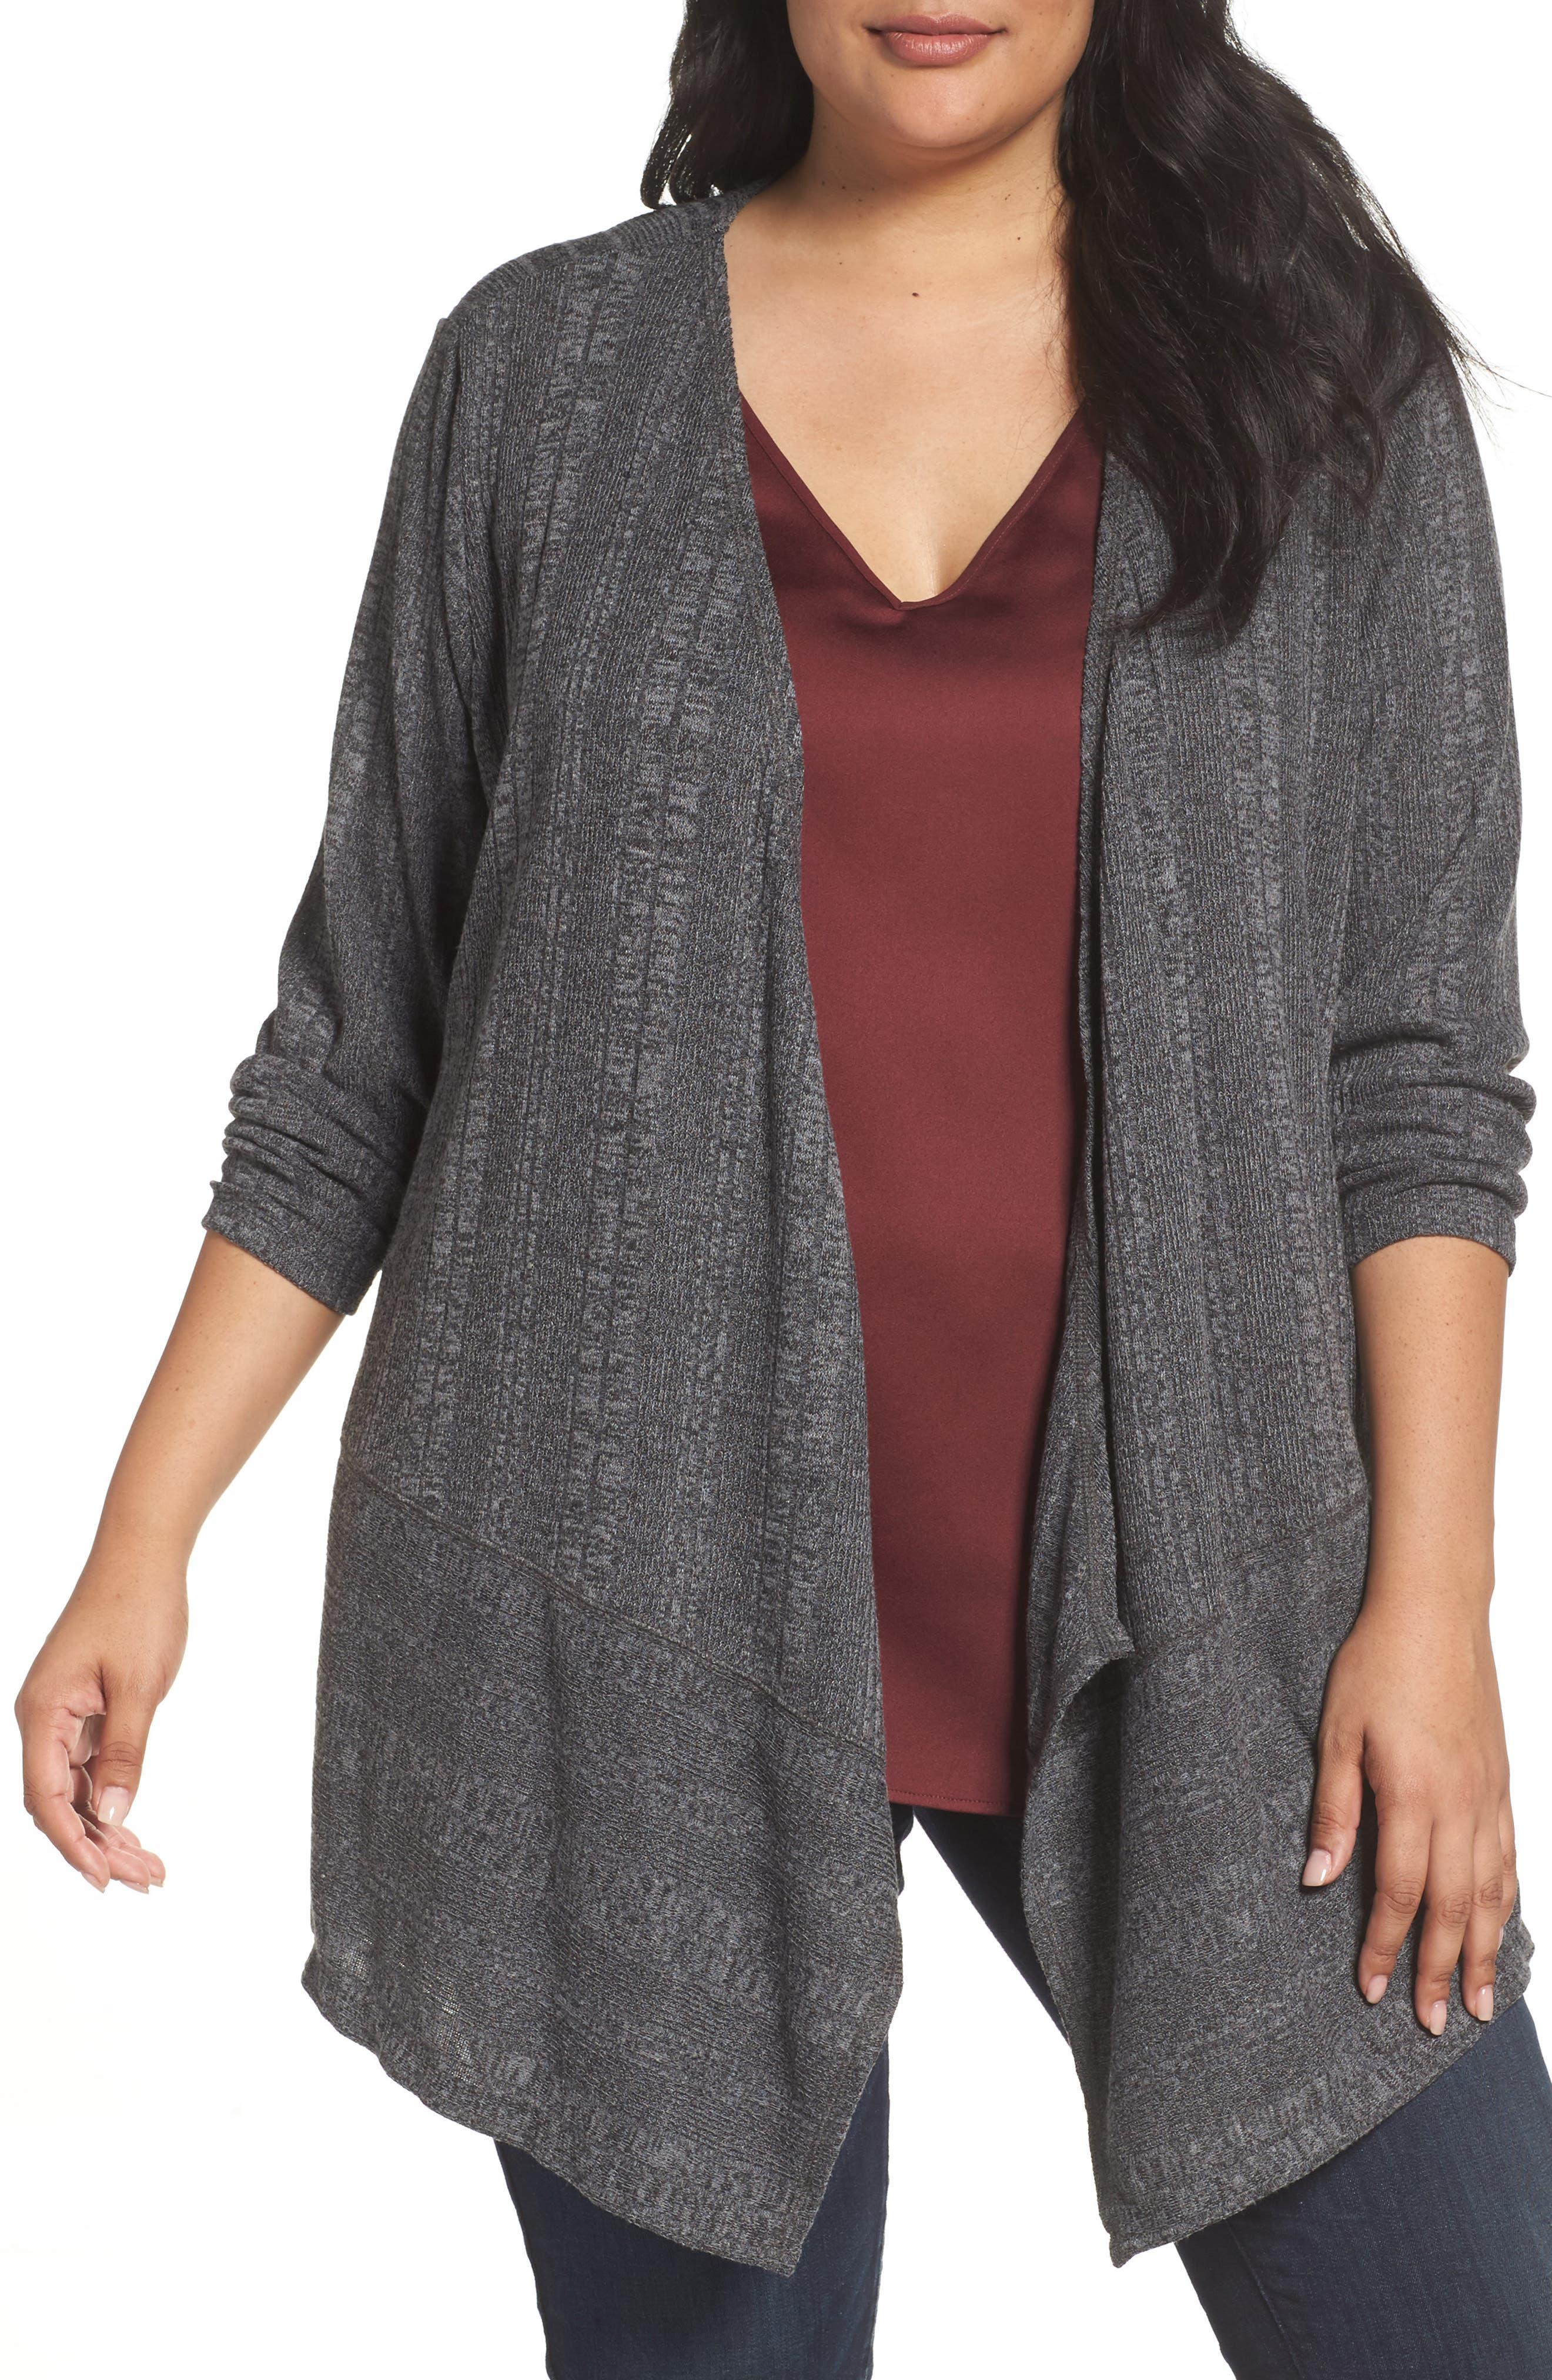 Ribbed Knit Cardigan,                         Main,                         color, Grey Charcoal Melange